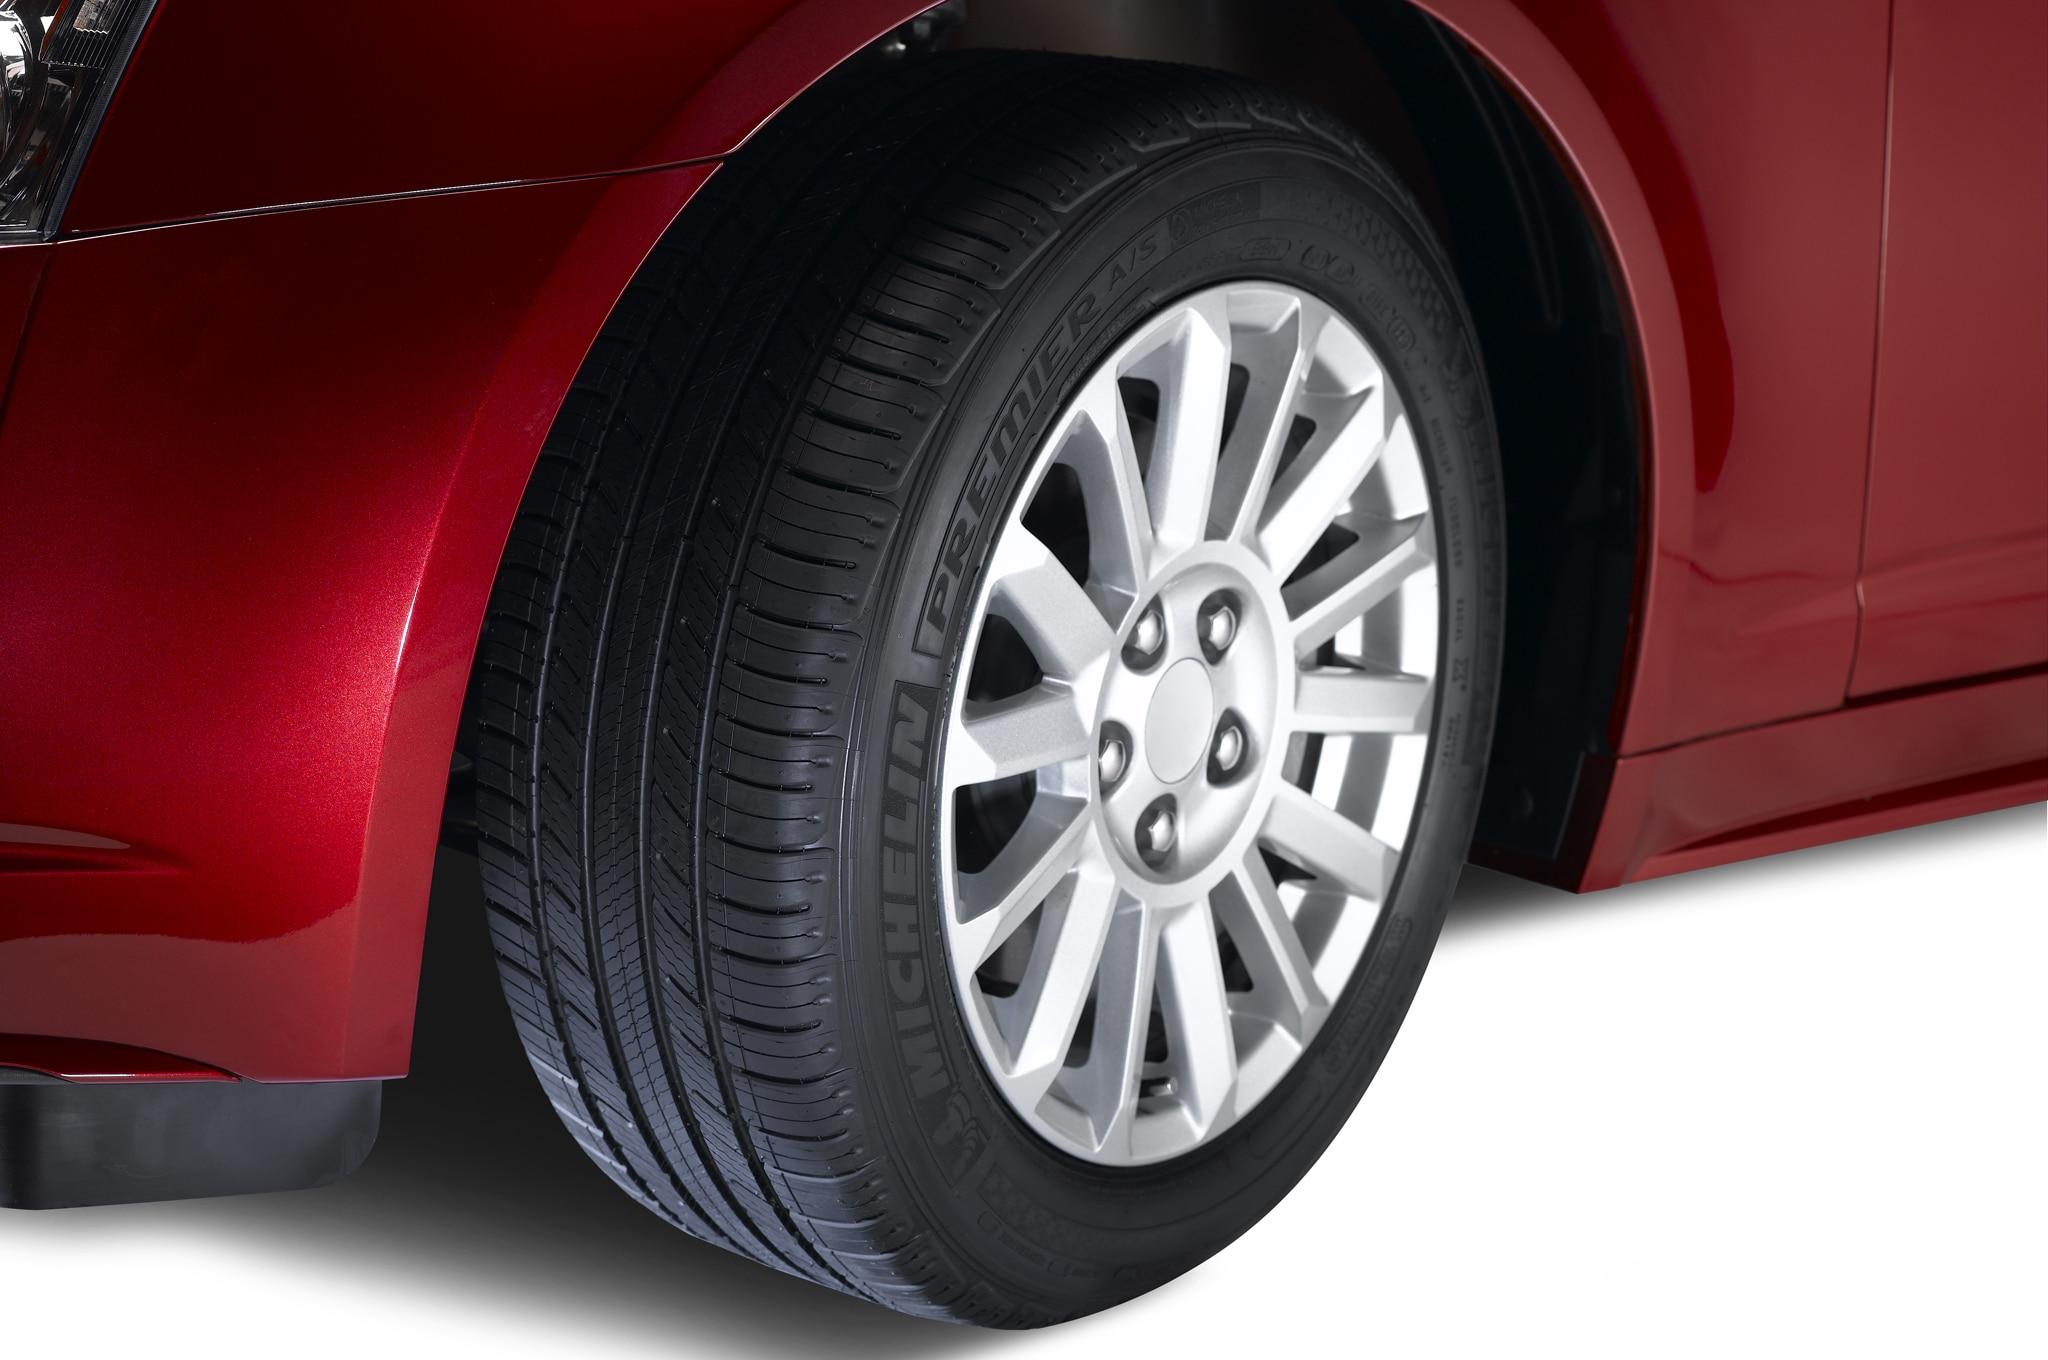 Michelin Premier Evergrip Tire On Car1